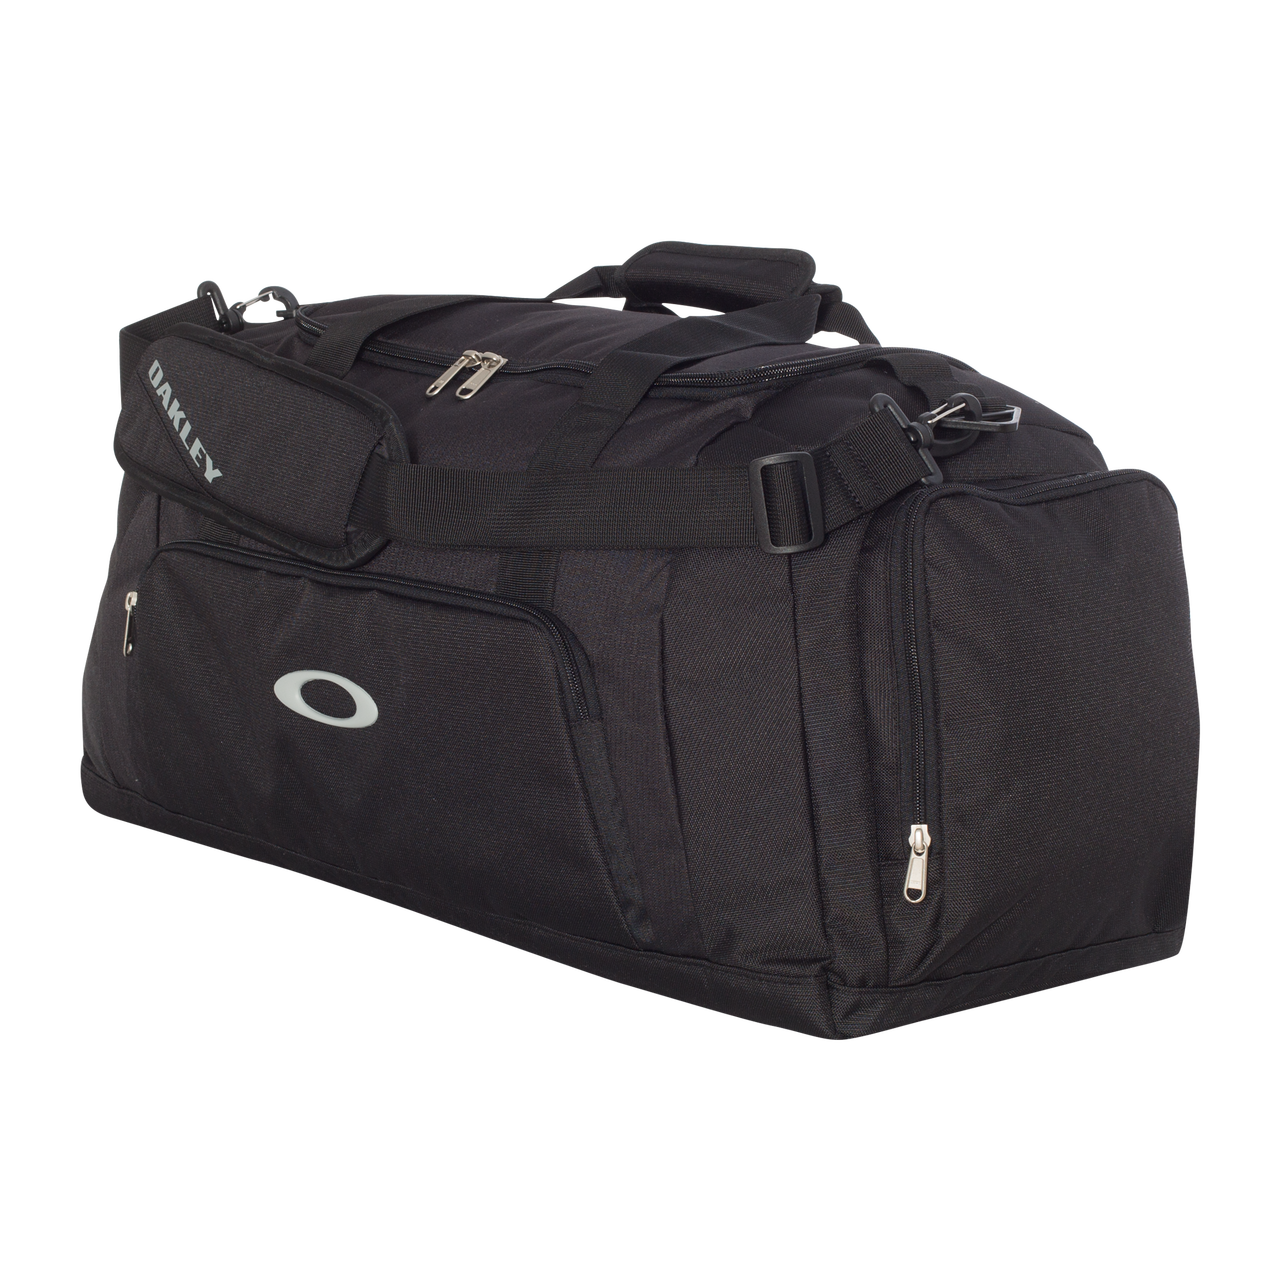 92904ODM Oakley Crestible Gym Duffle Bag   T-shirt.ca